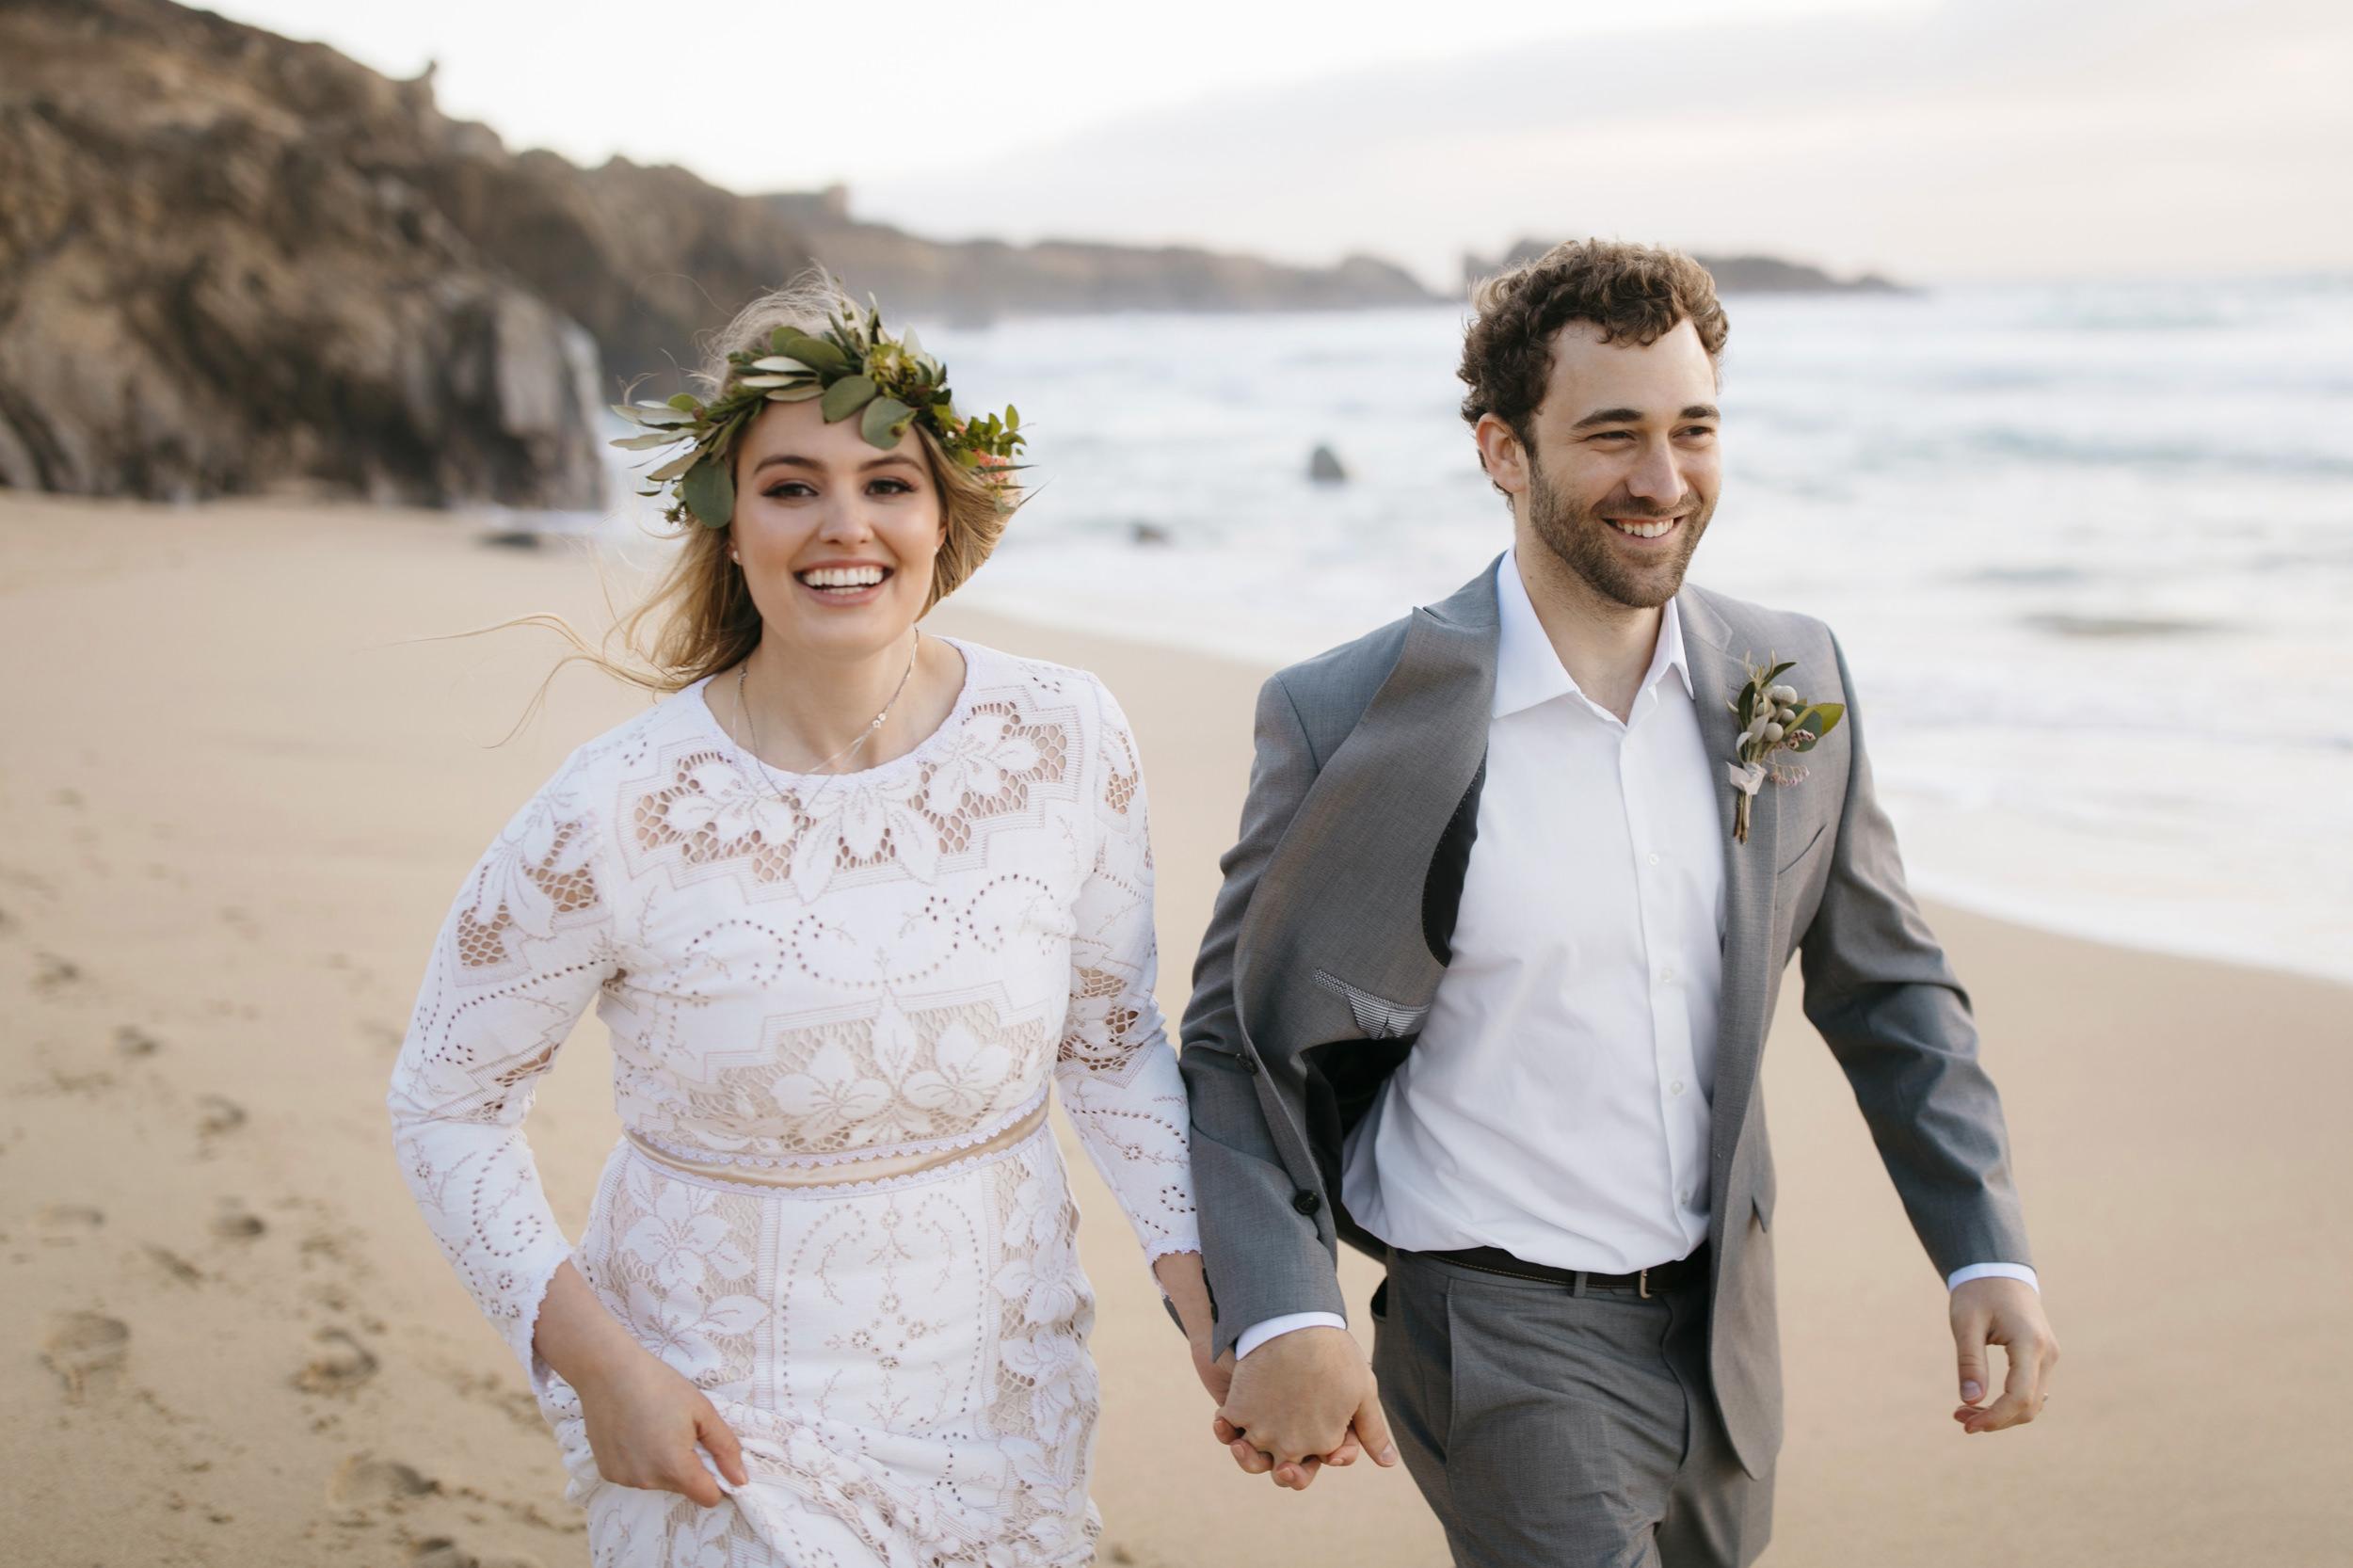 big-sur-elopement-california-adventure-wedding-photographer 303.JPG